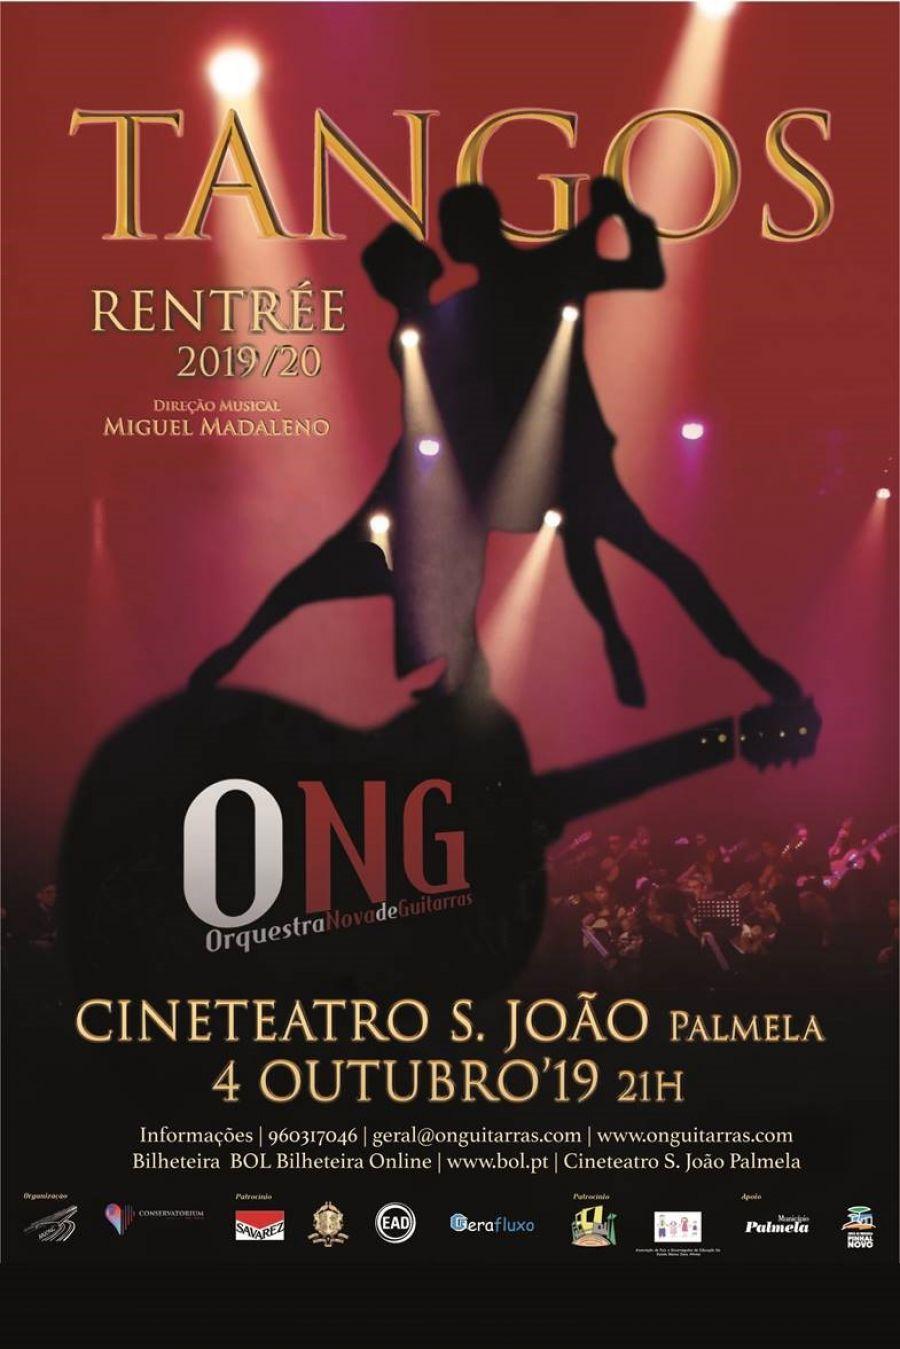 Rentreé 2019/2020 - Tangos